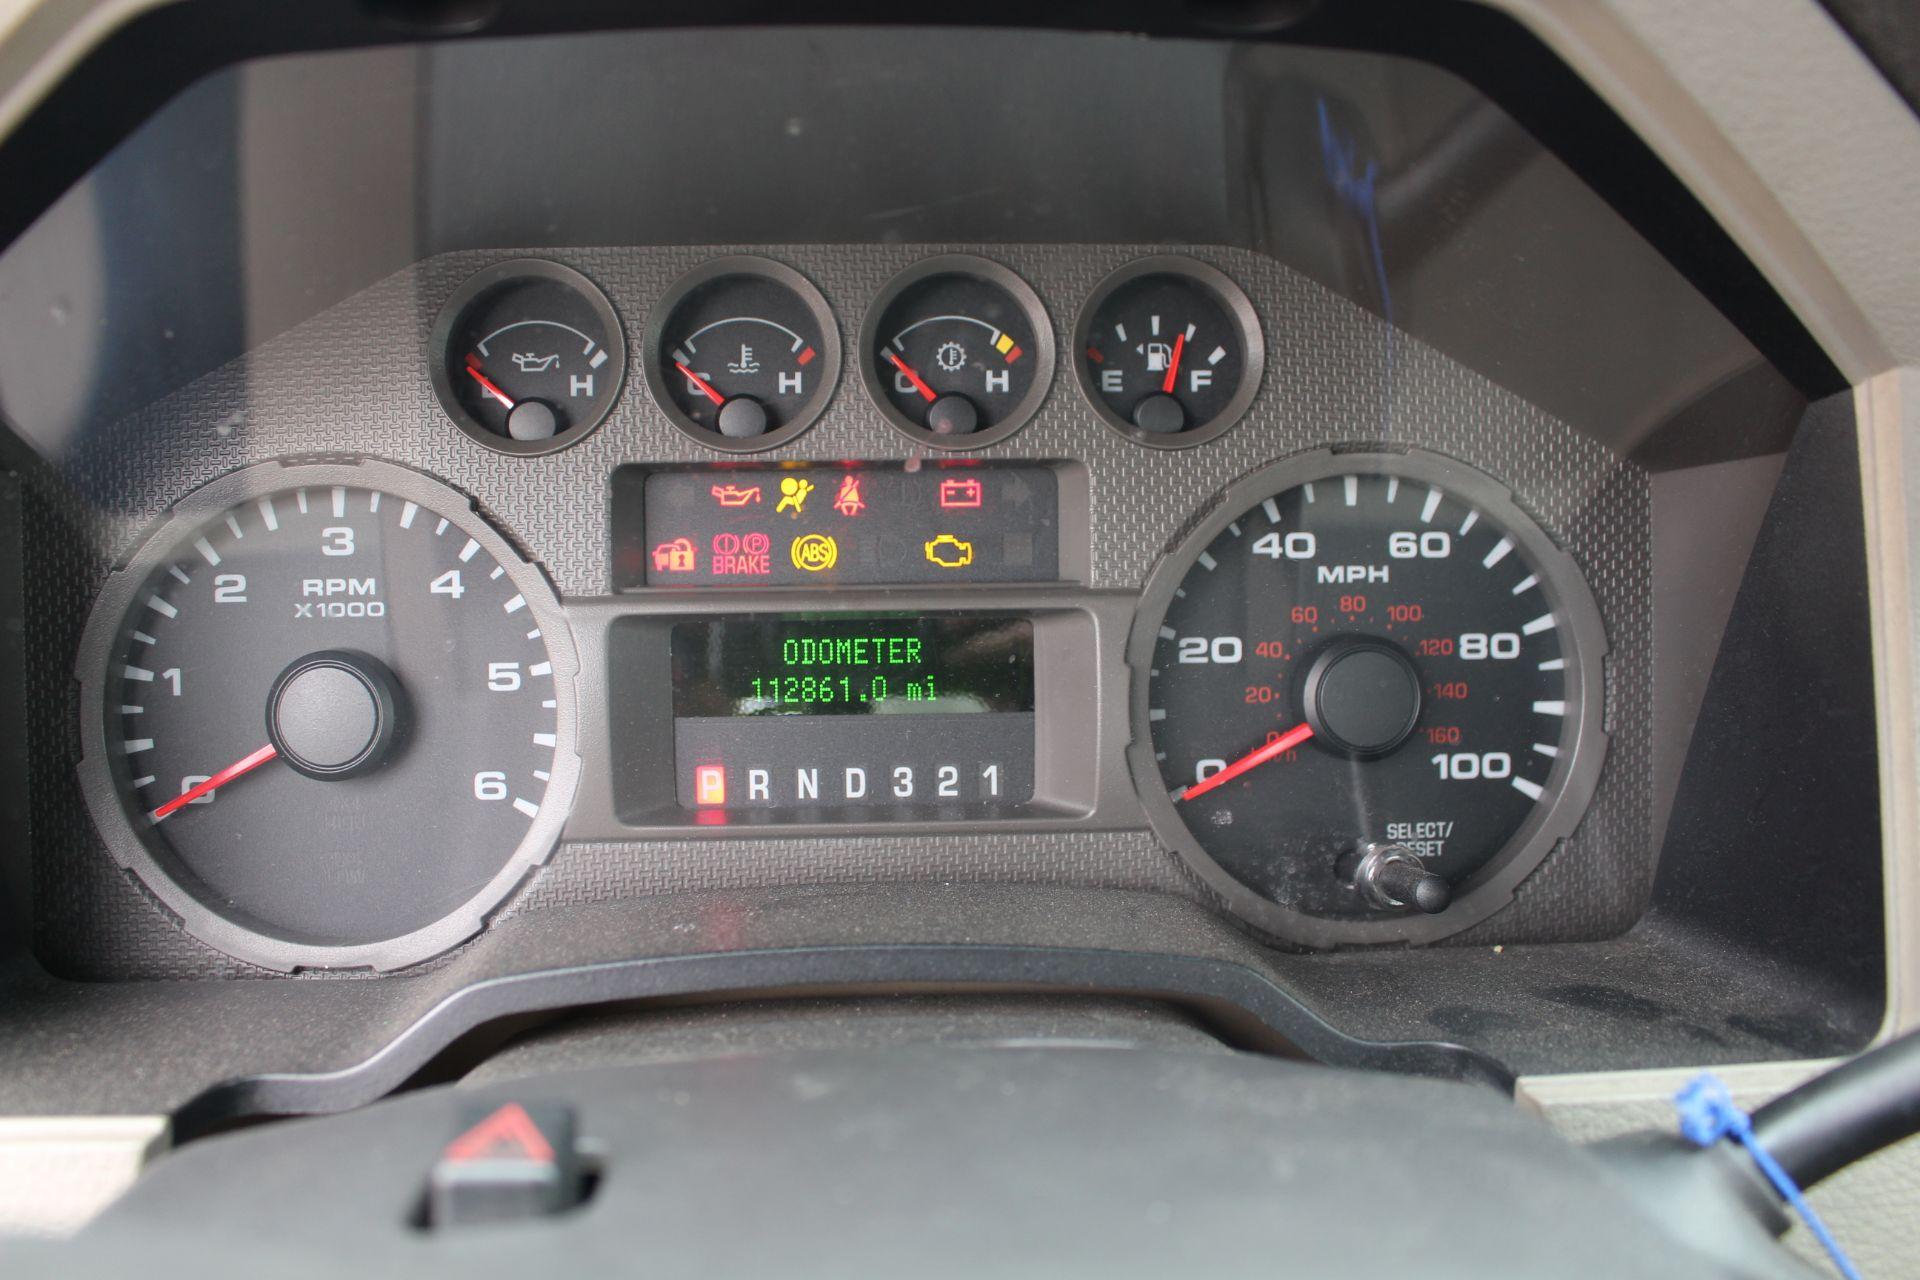 2008 FORD F350 XL SUPER DUTY STAKE BED TRUCK, 12' ROYAL BED BODY, 5.4L EFI V8 GASOLINE ENGINE, - Image 13 of 16